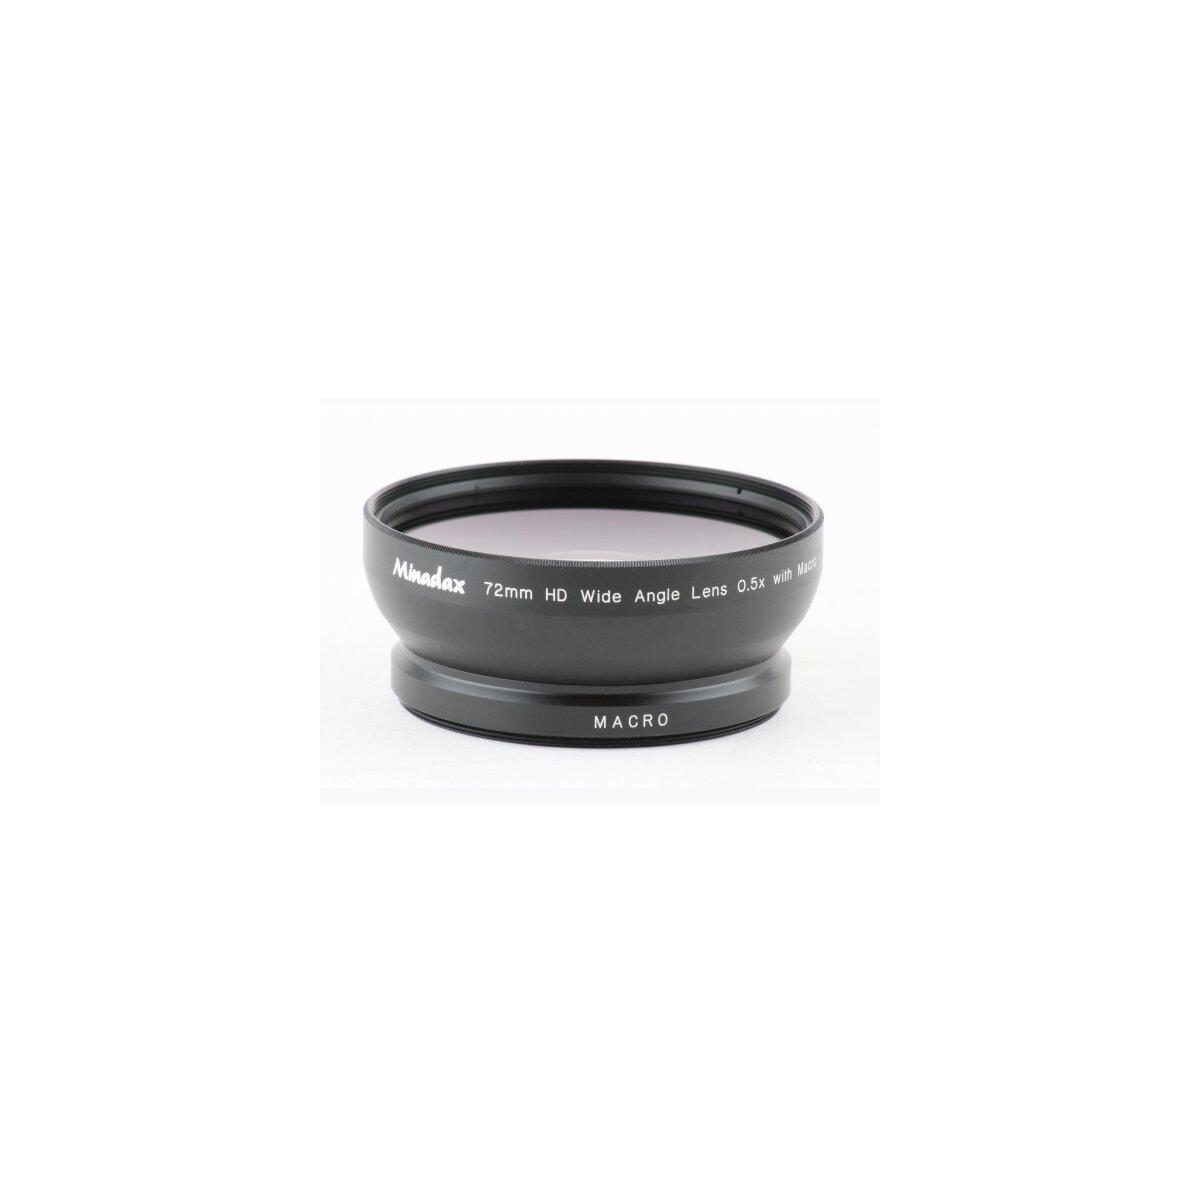 0.5x Minadax Weitwinkel Vorsatz mit Makrolinse für Panasonic AG-DVX100, AG-DVX100A, AG-DVX100B, AG-HVX100, AG-HPX170 US Version, AG-HPX171 EU Version, AG-HMC151